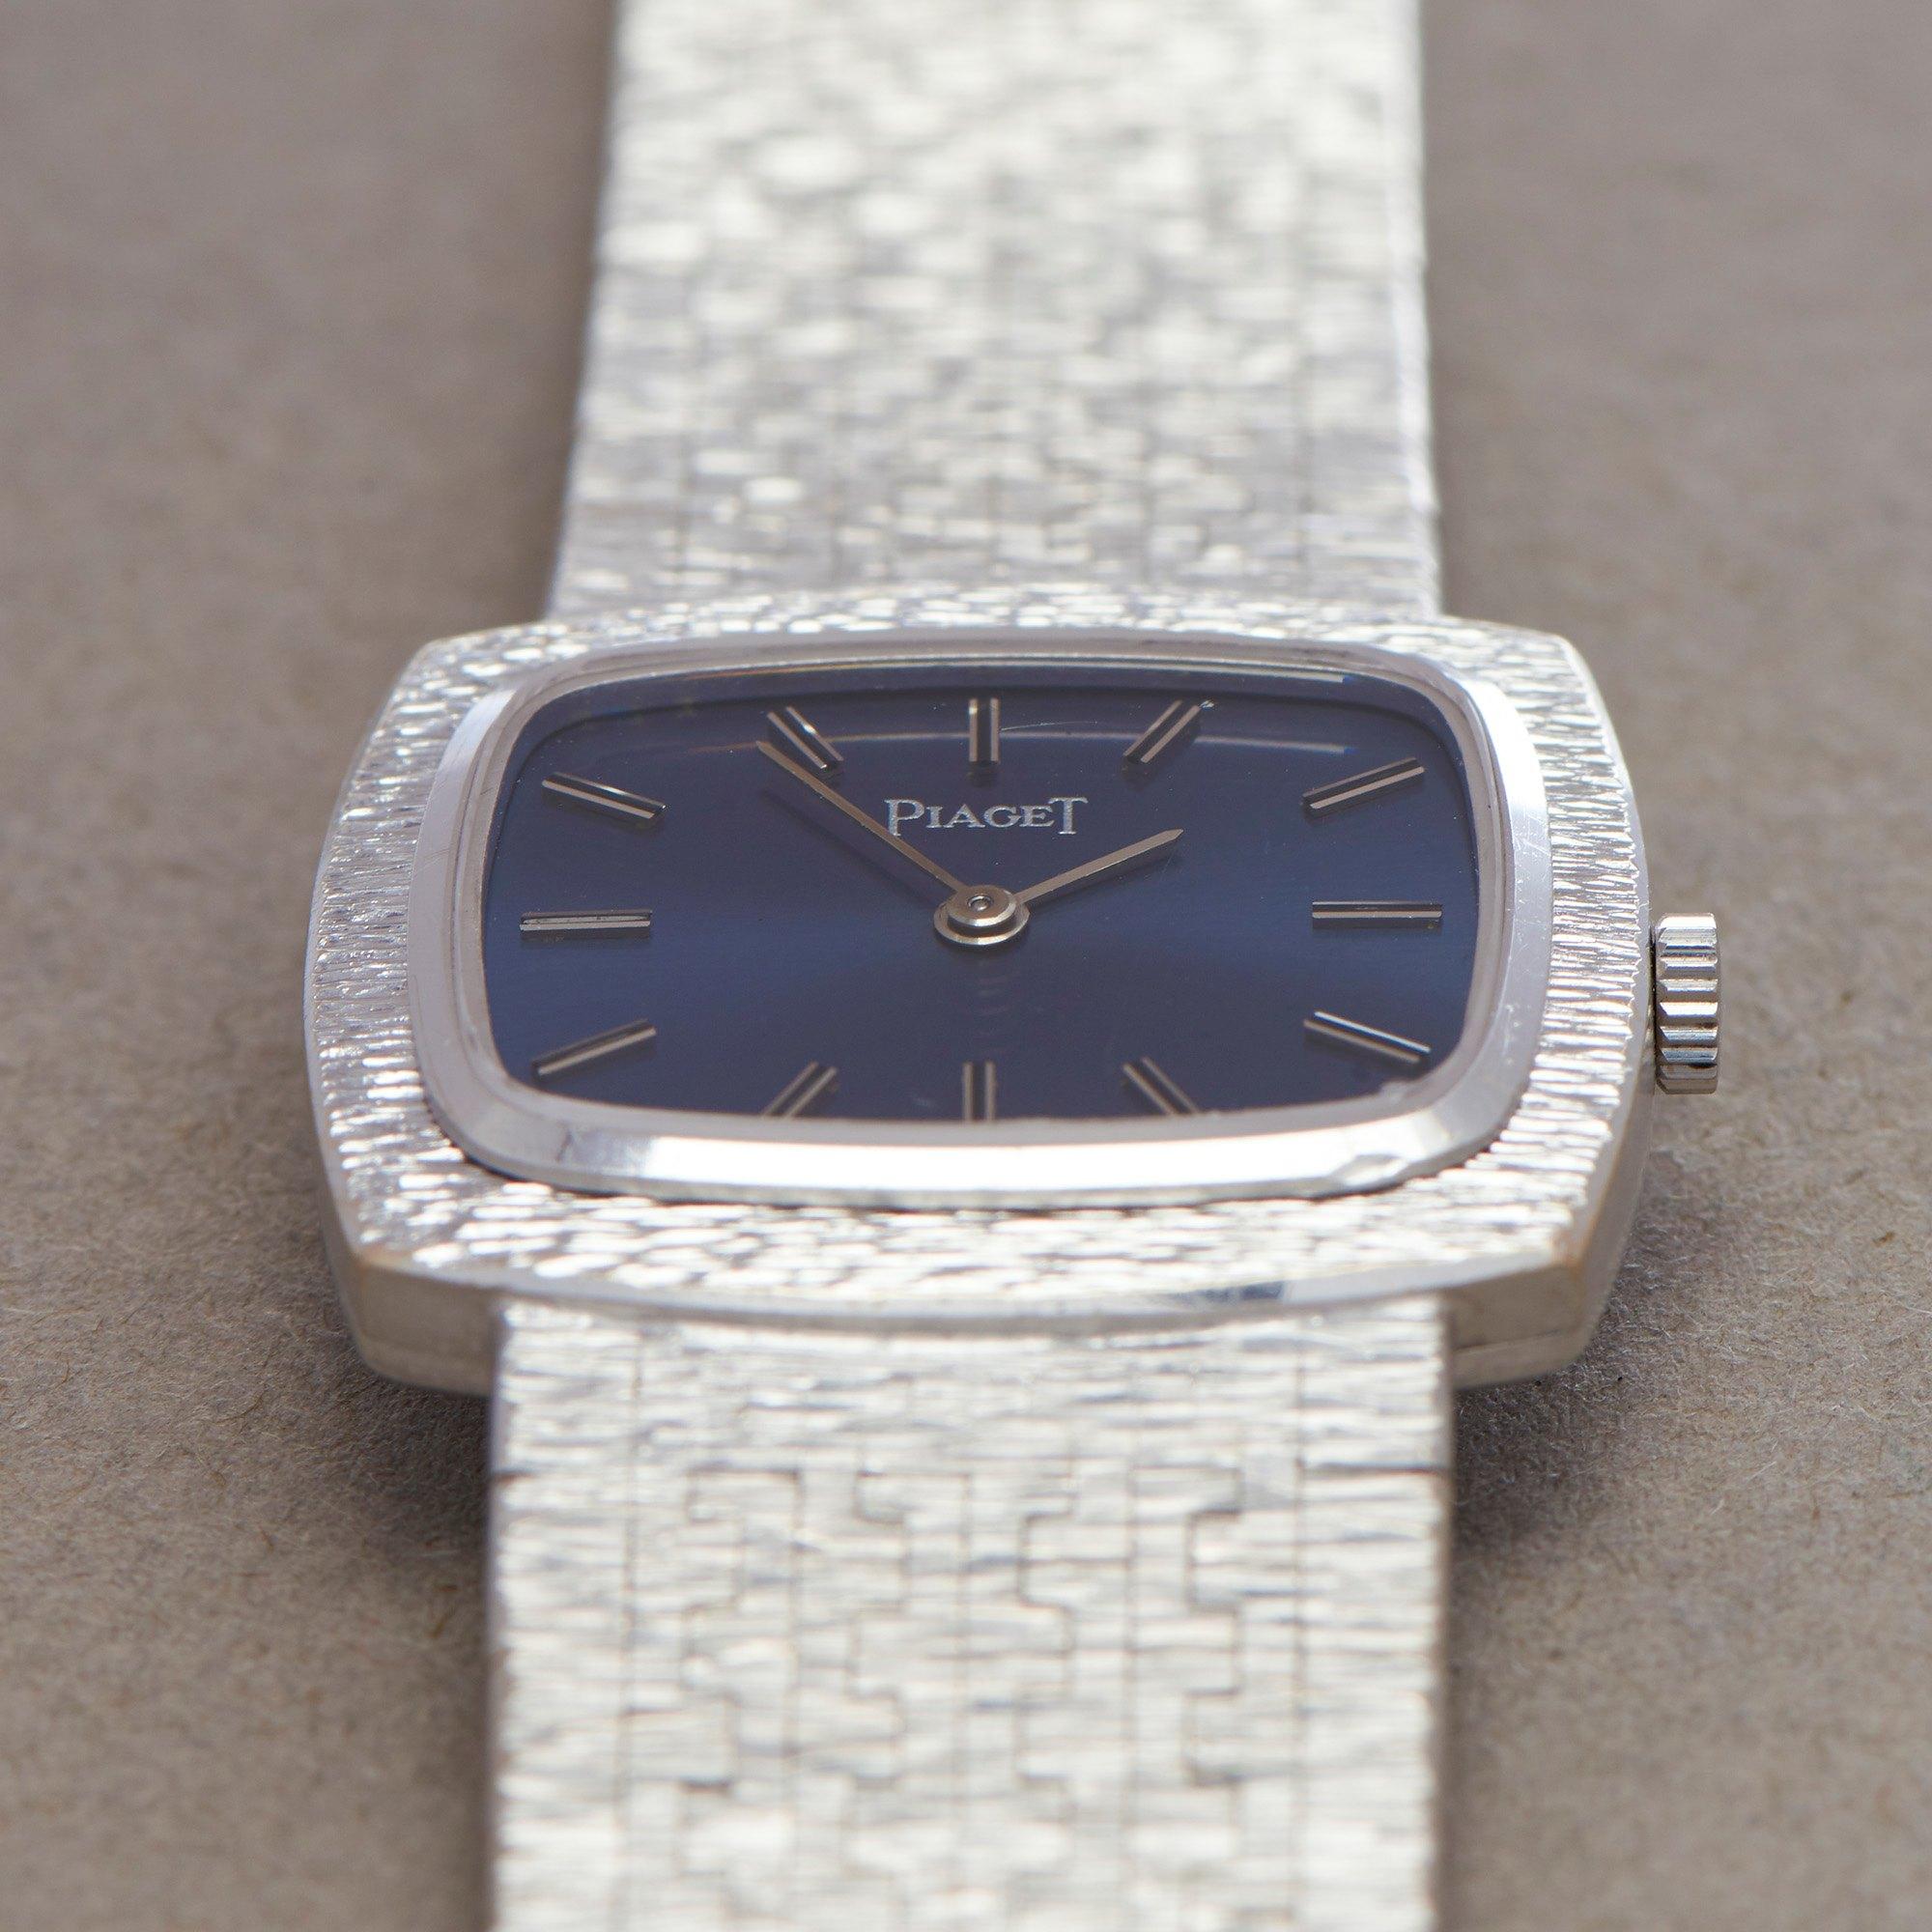 Piaget Vintage 18K White Gold 9562A6